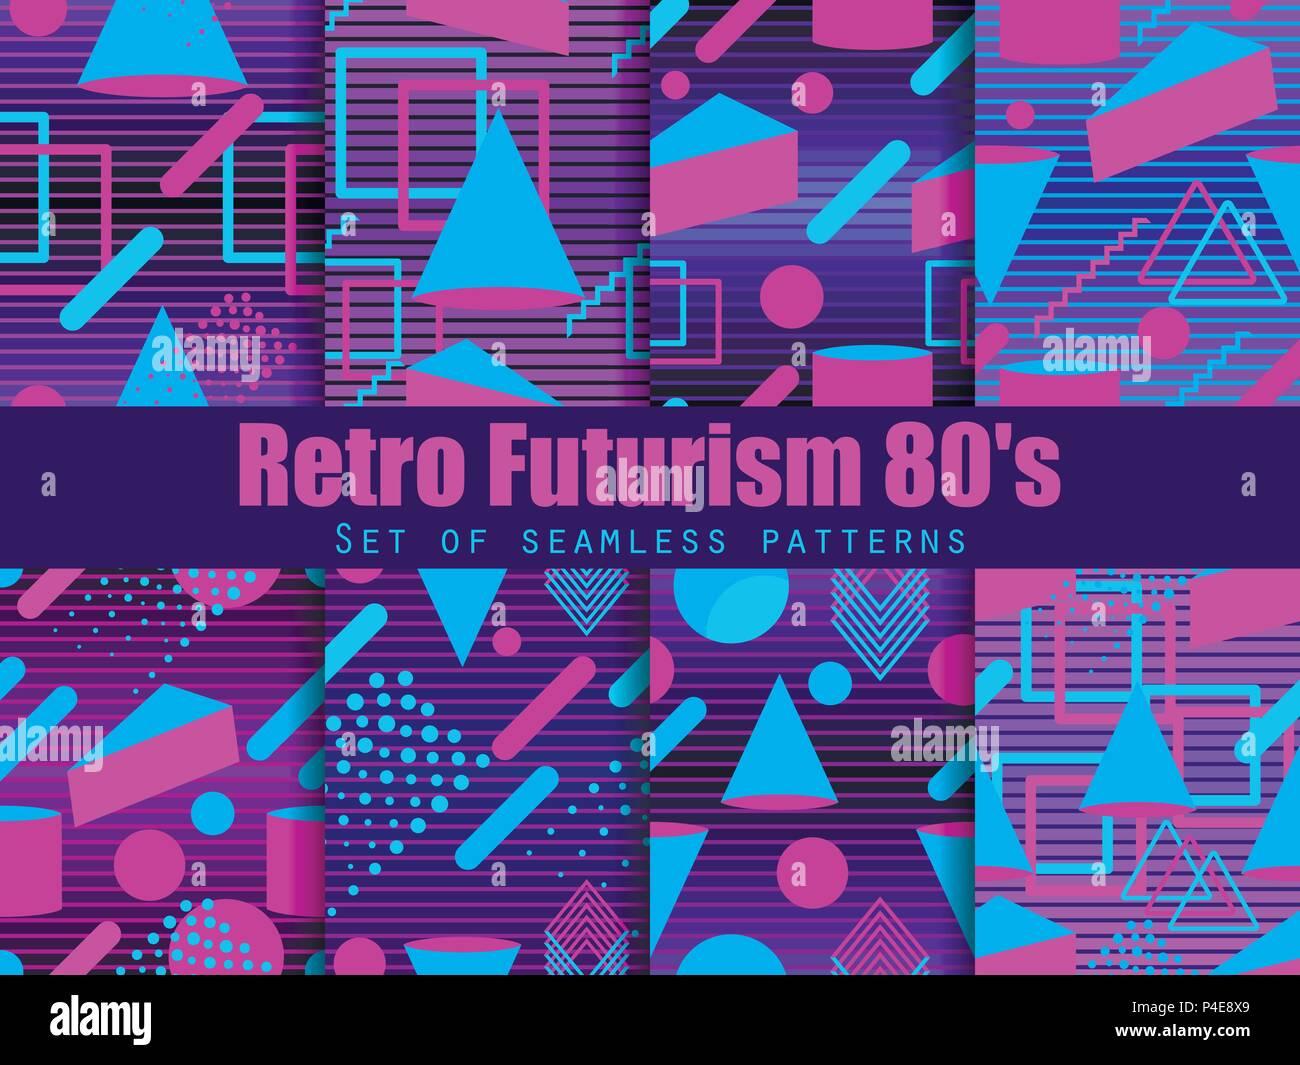 Retro futurism seamless pattern set  Geometric elements